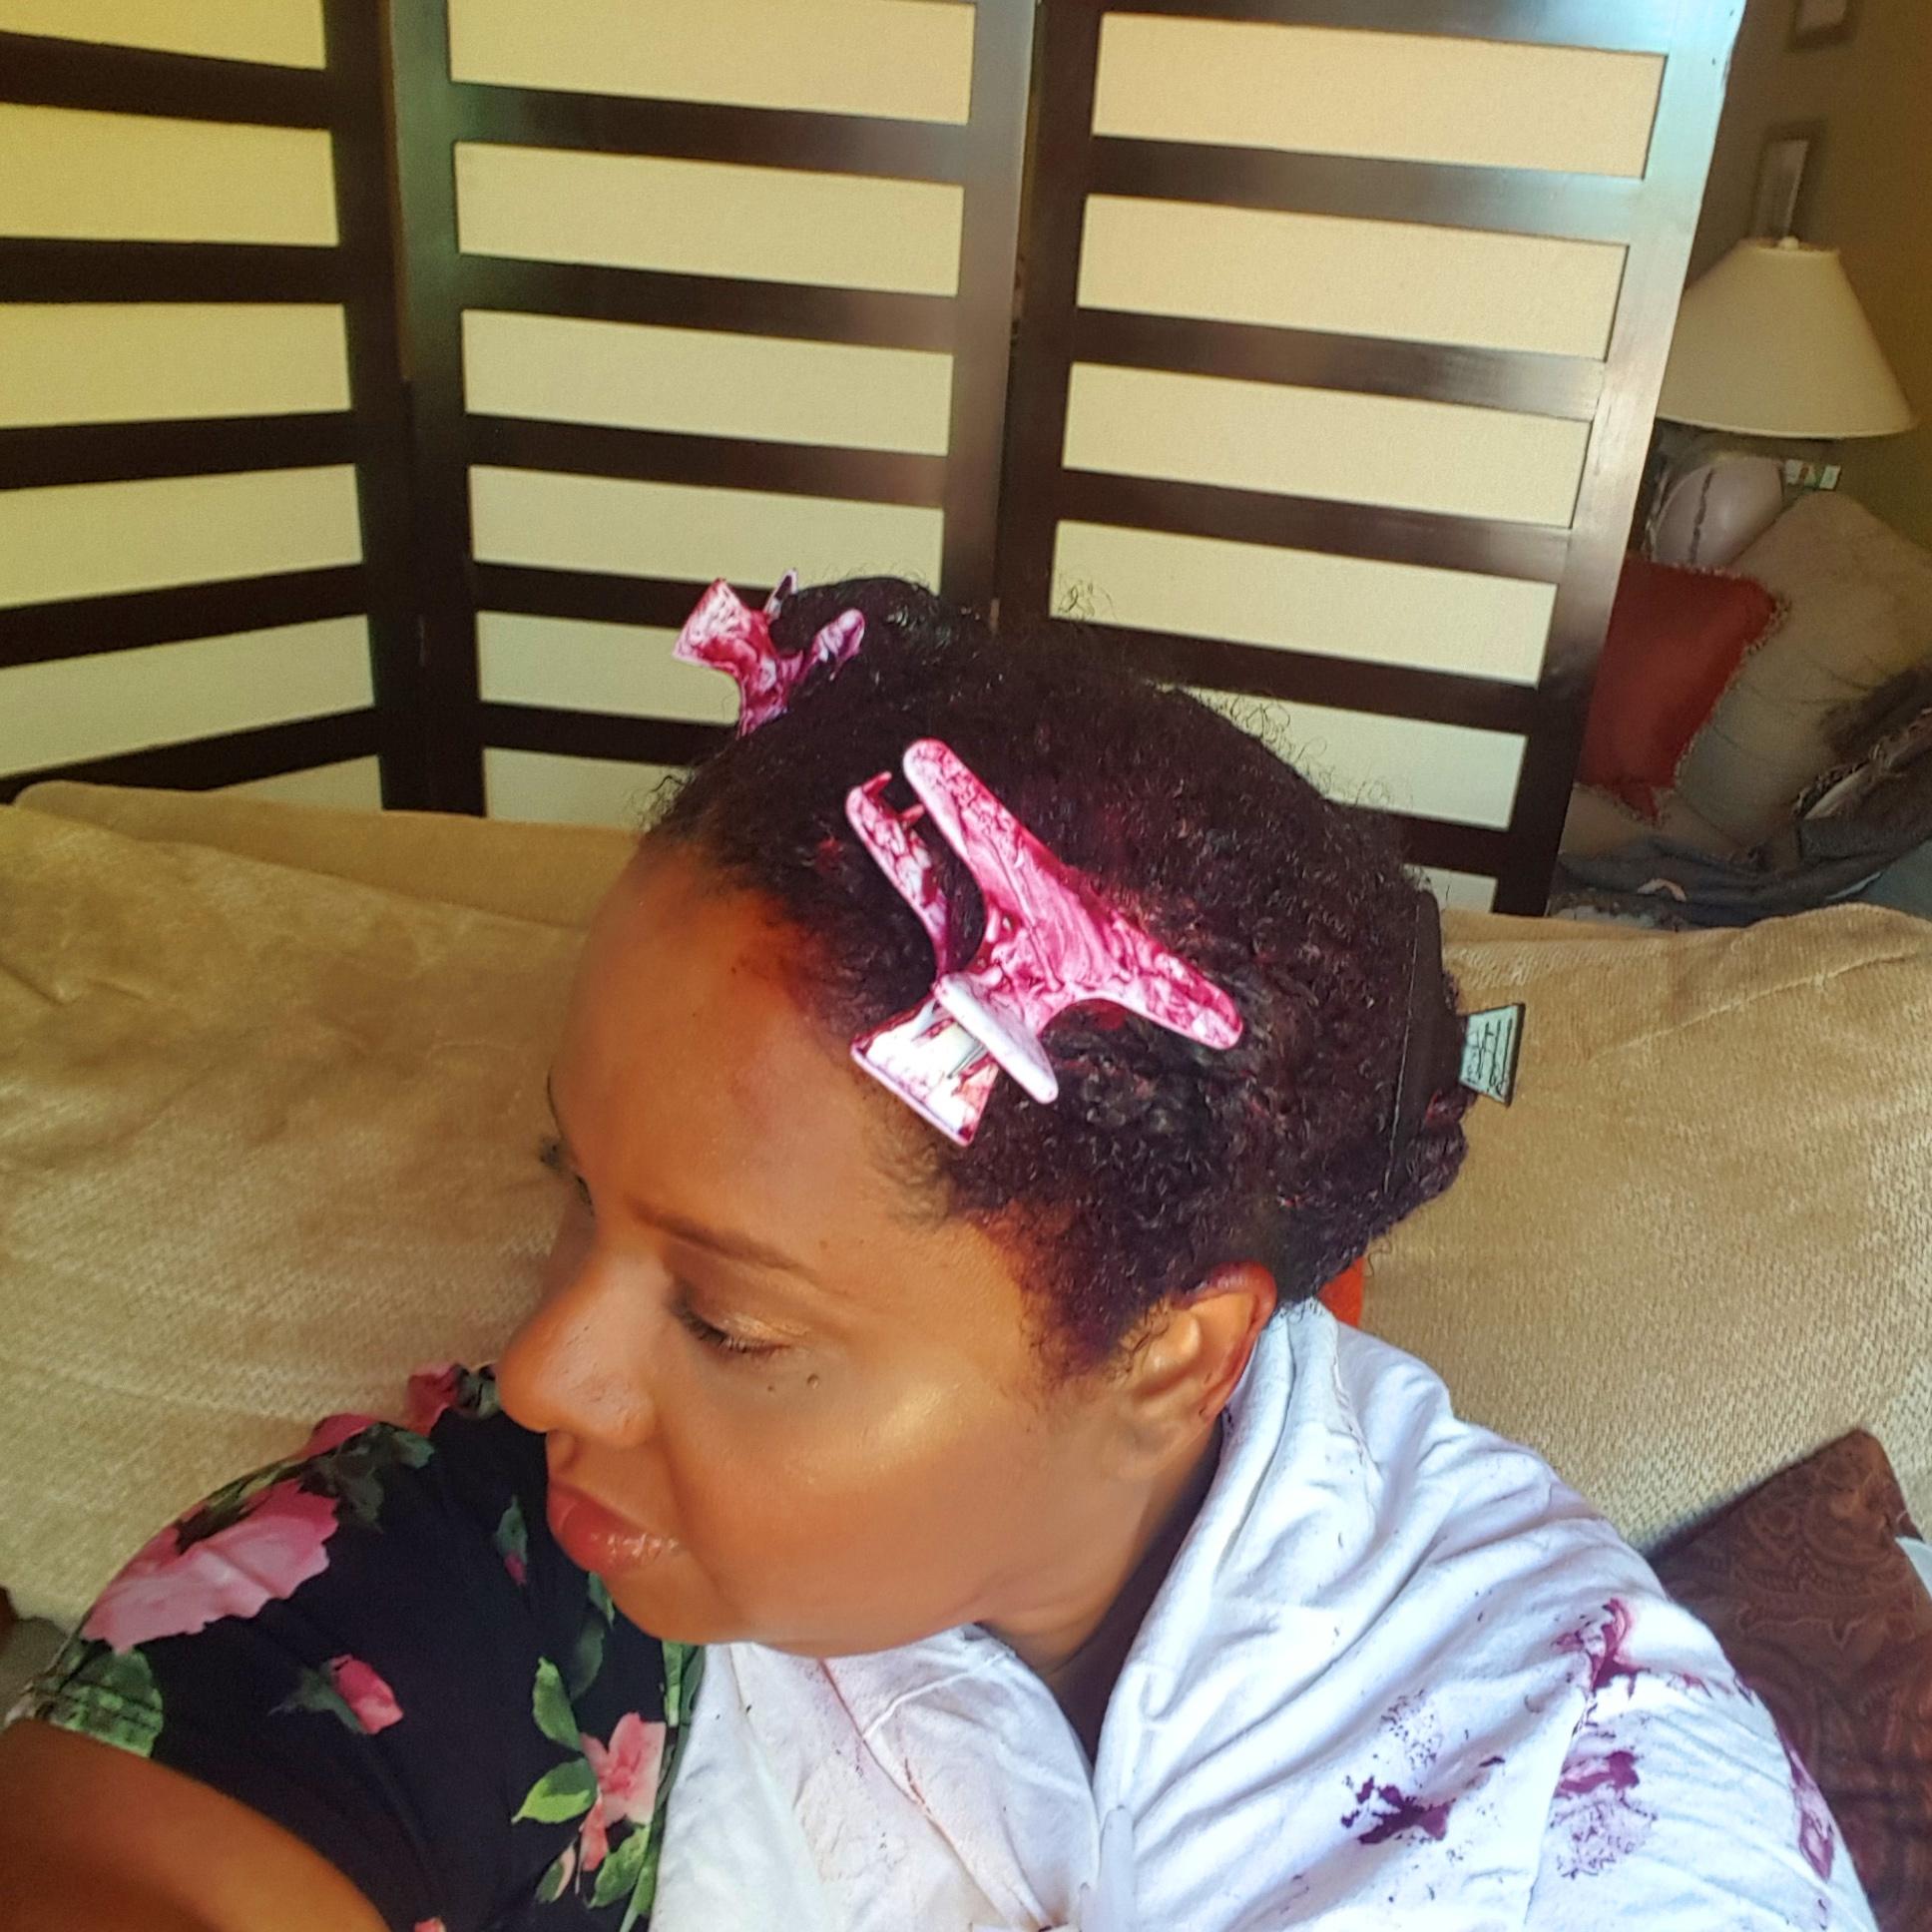 Dye Hair in Hair